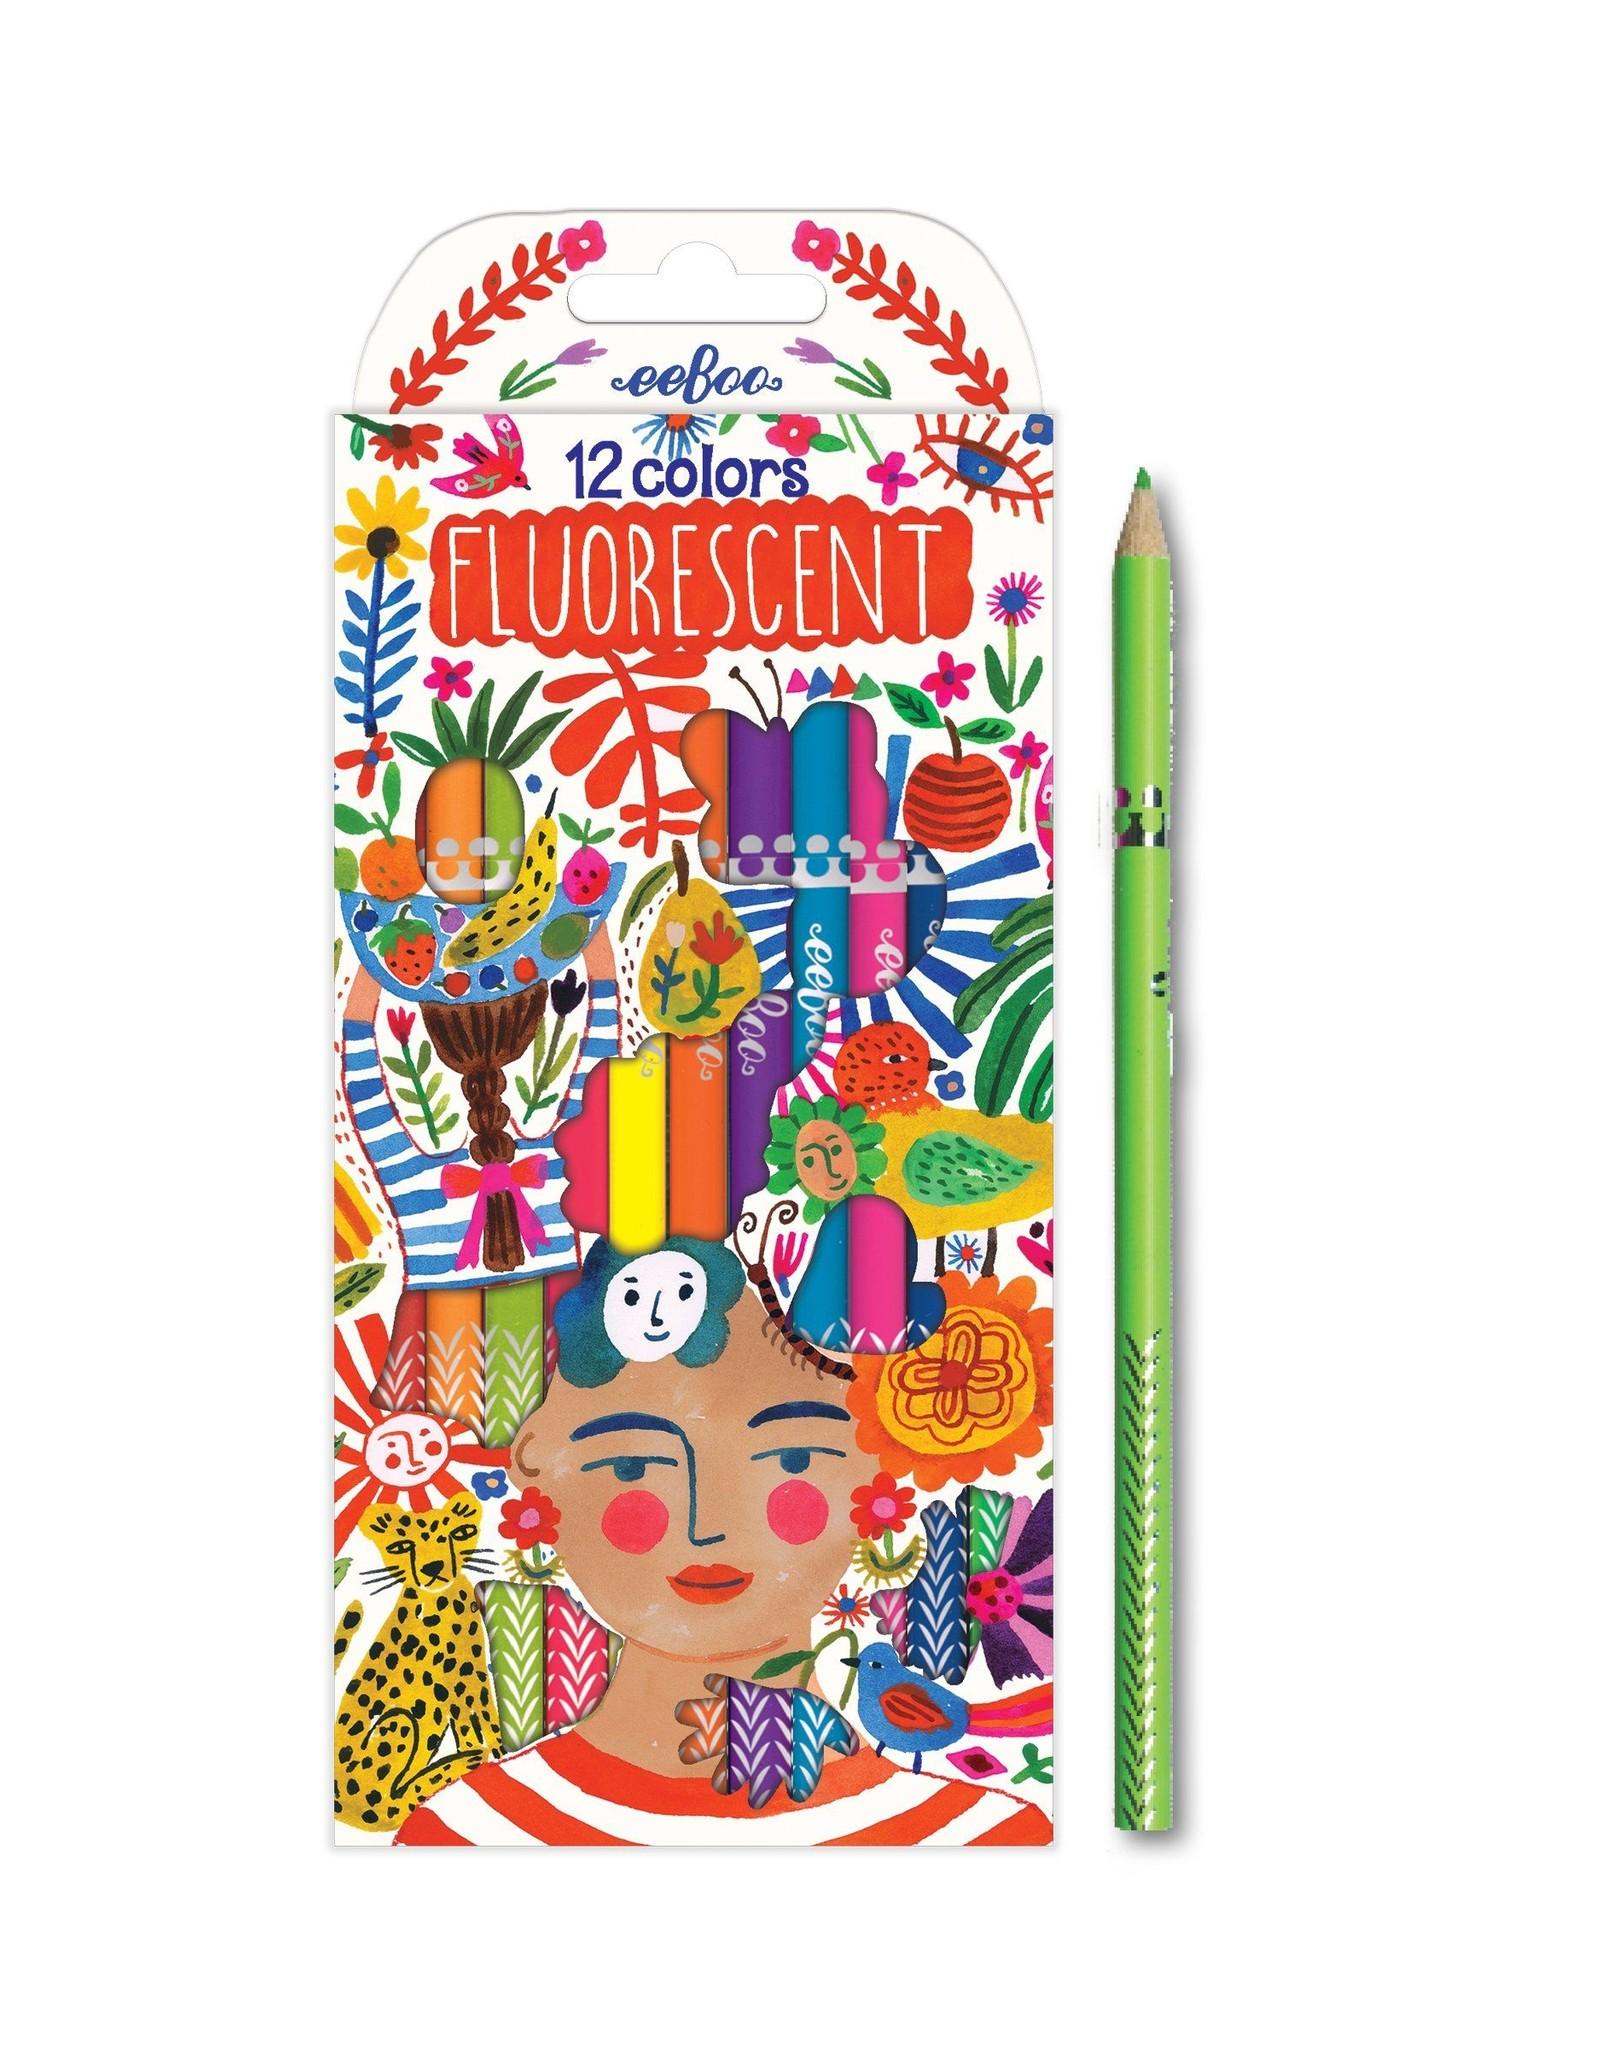 eeBoo Colored Pencils - Florescent Positivity